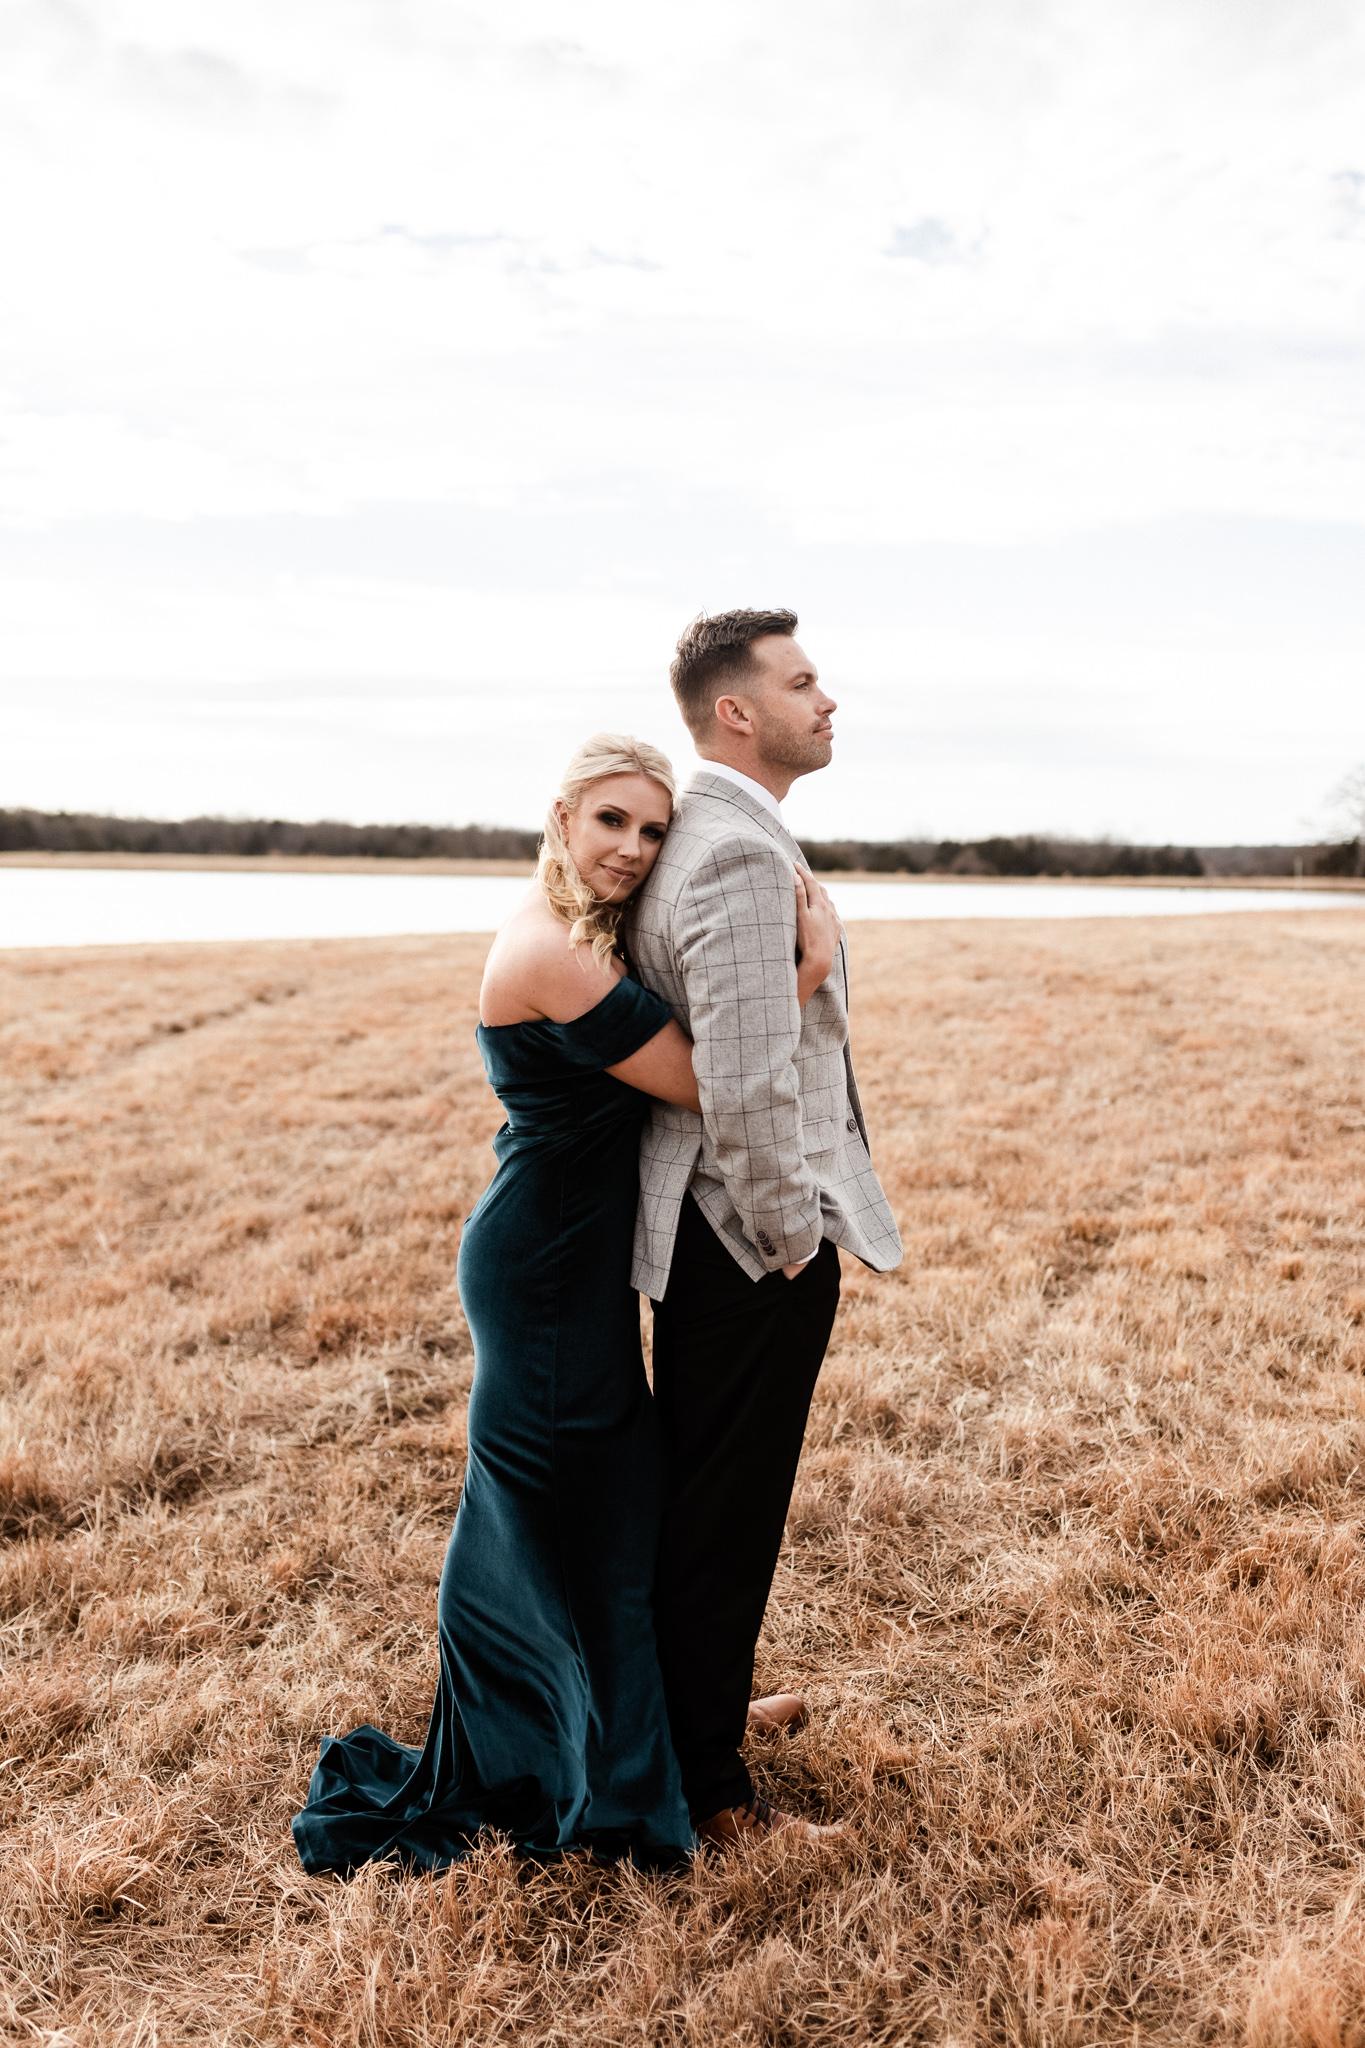 Wade + Stephanie | Warm Open Field Engagements | Oklahoma Wedding Photographer-22.jpg